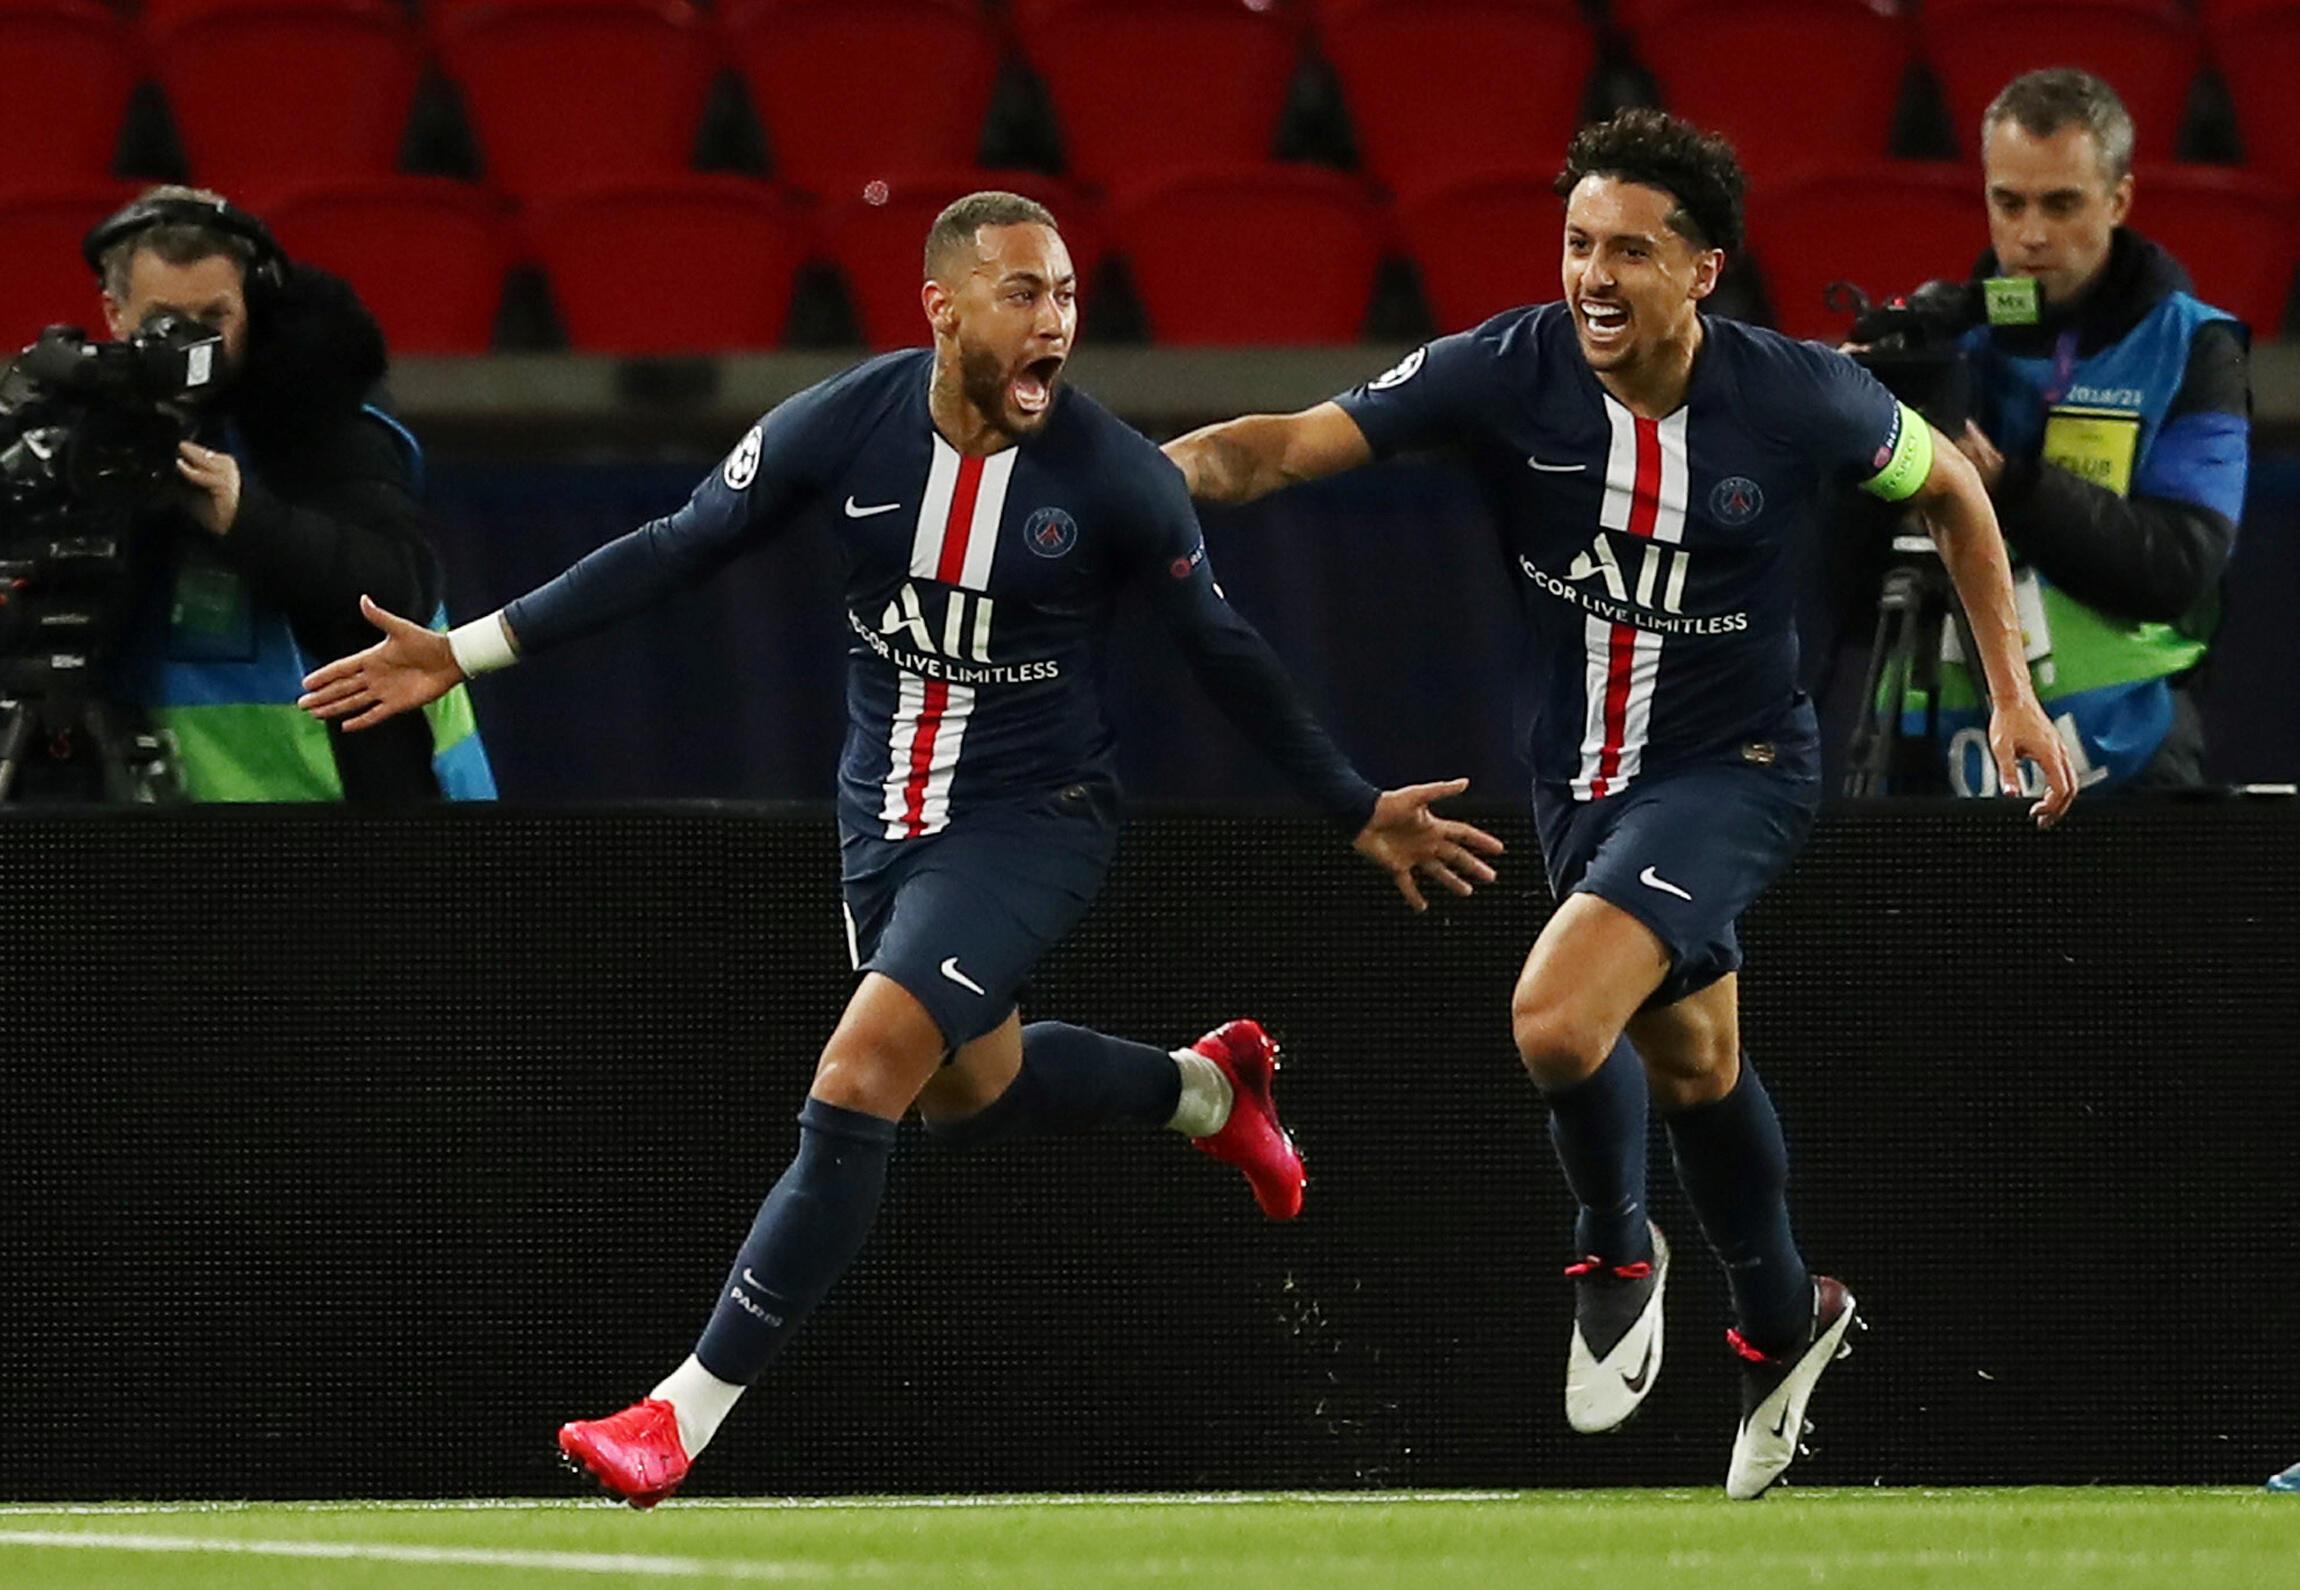 Neymar - Marquinhos - PSG- Paris Saint-Germain - Football